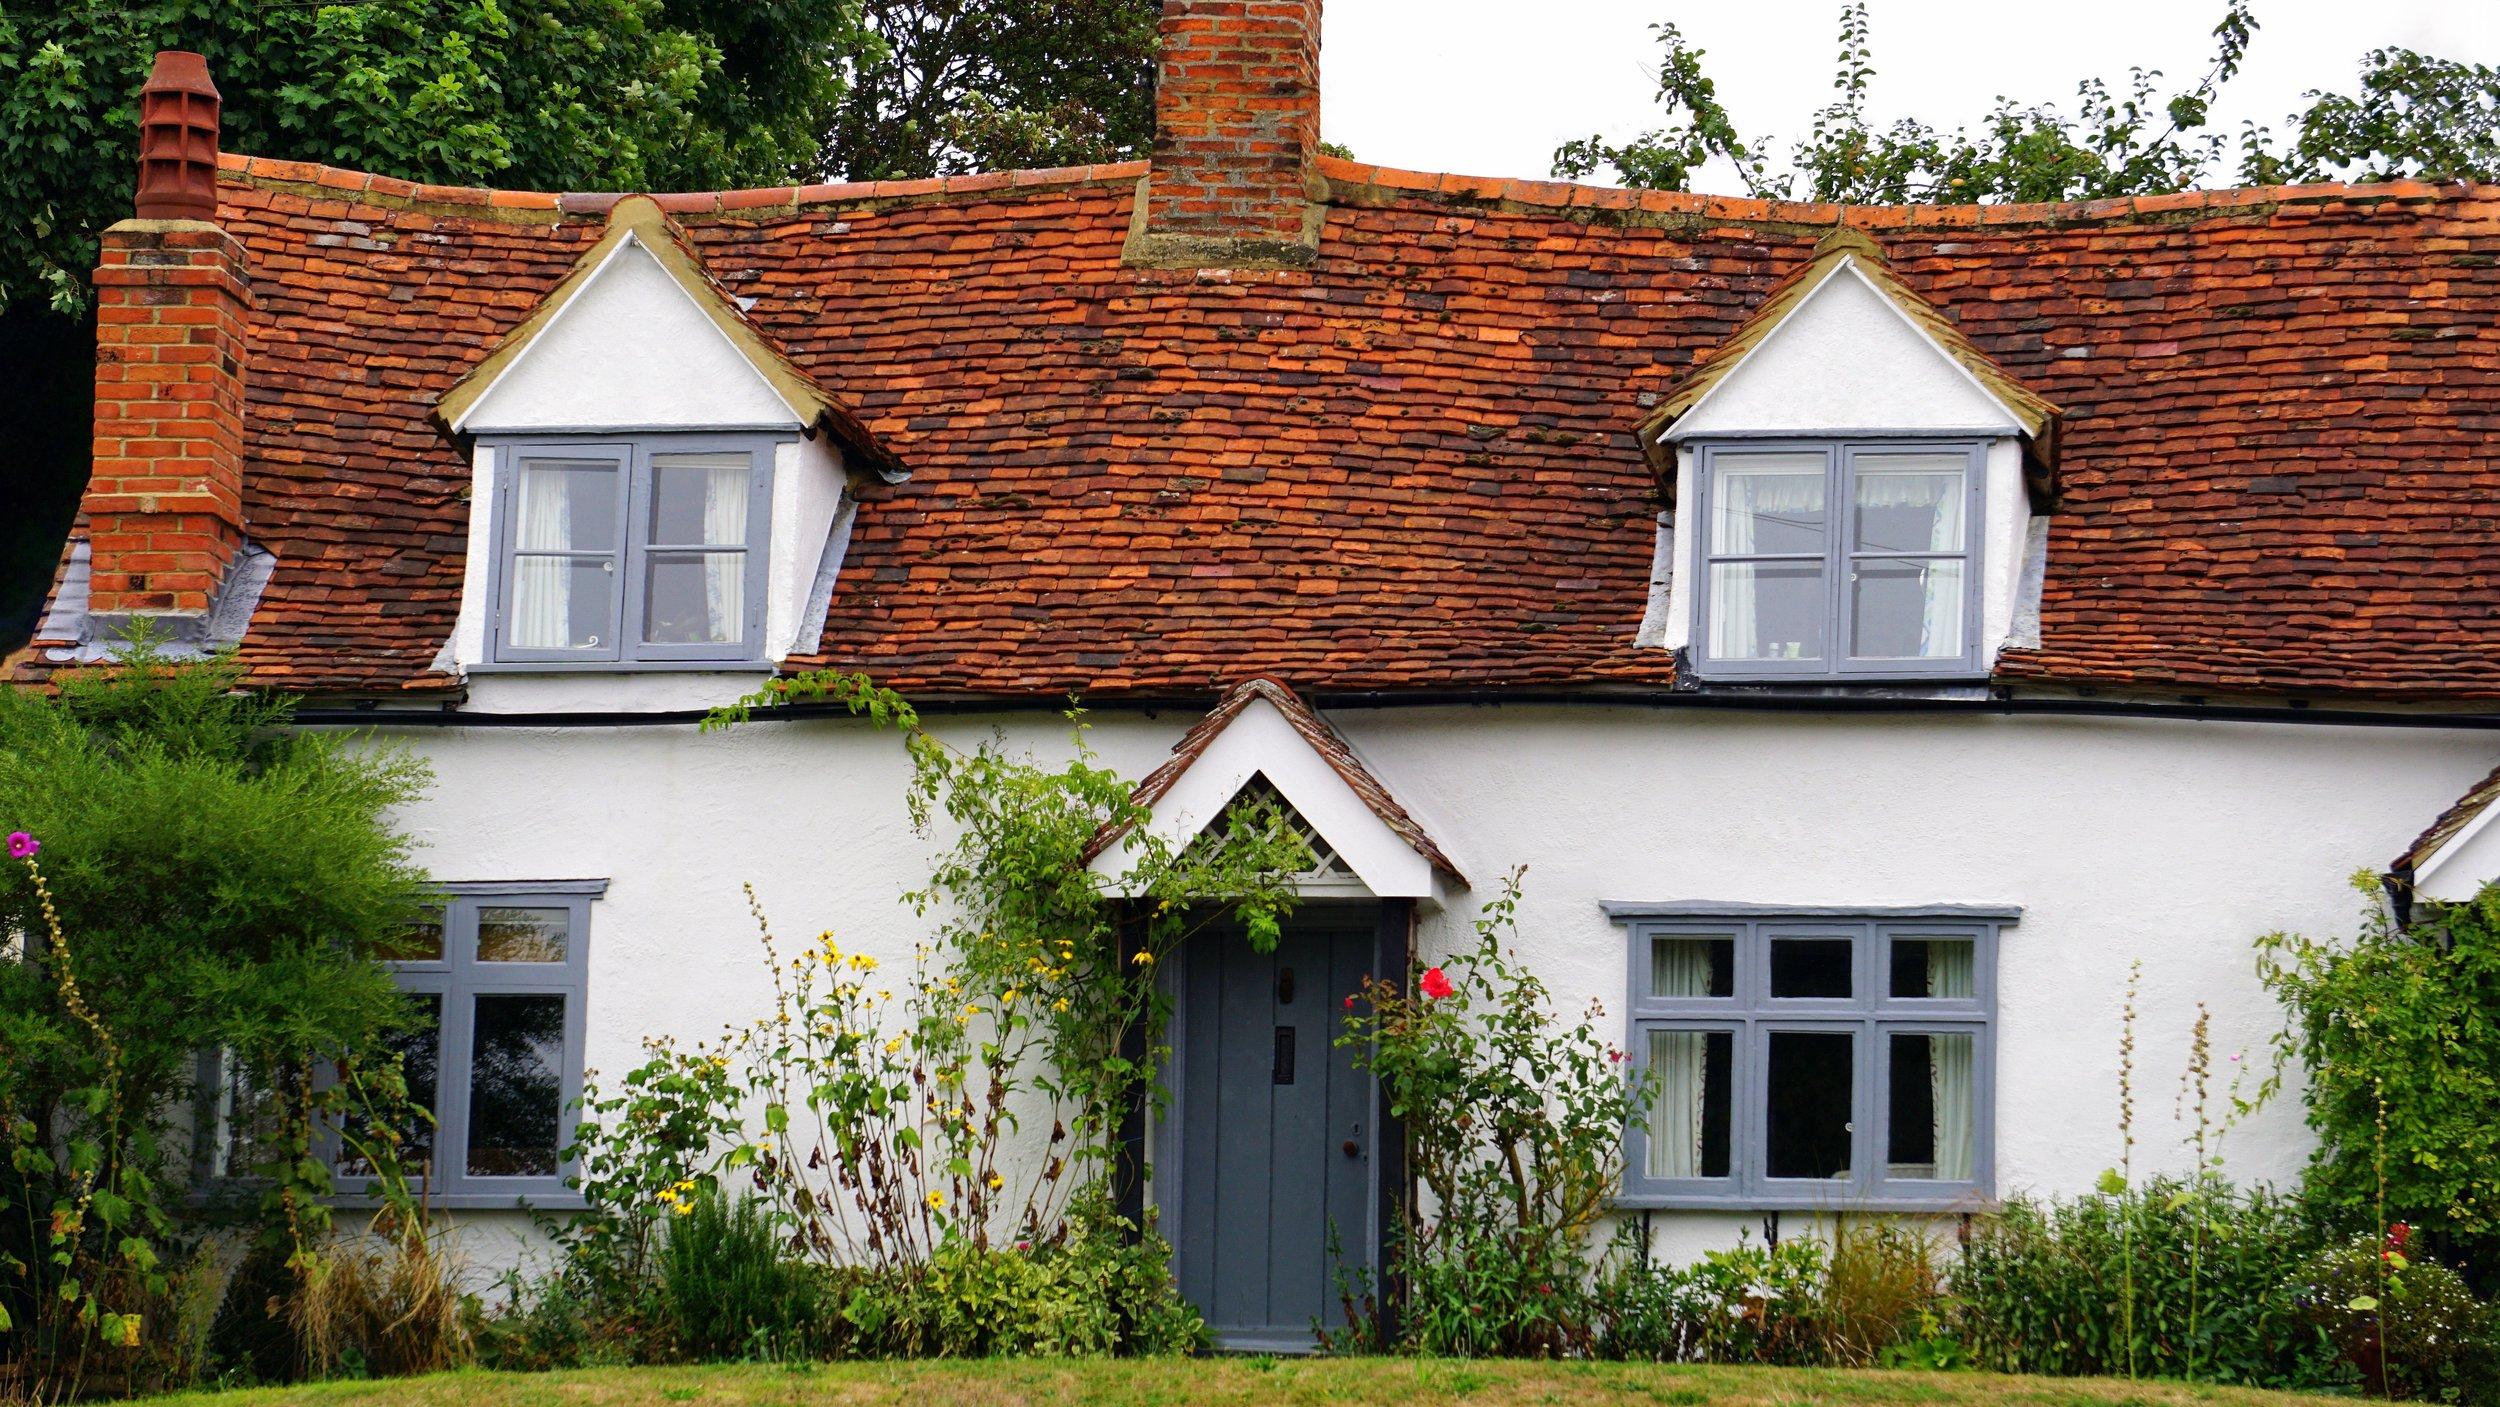 architecture-bricks-building-166669.jpg